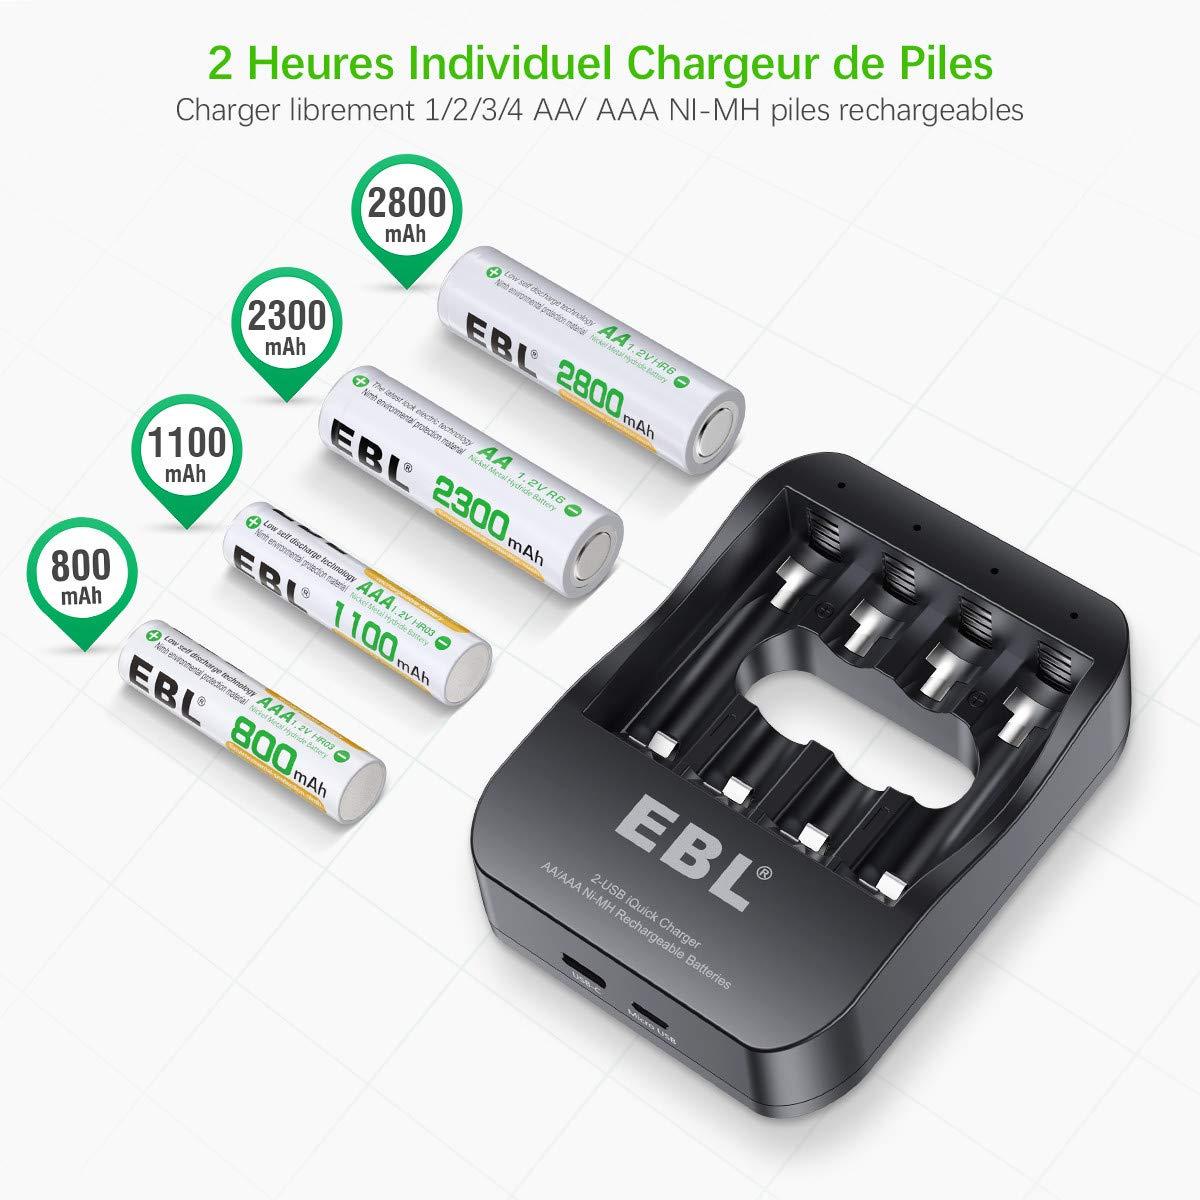 EBL Chargeur iQuick Rapide de Pile Rechargeable avec 4 Piles Rechargeables Ni-MH AAA 1100mAh